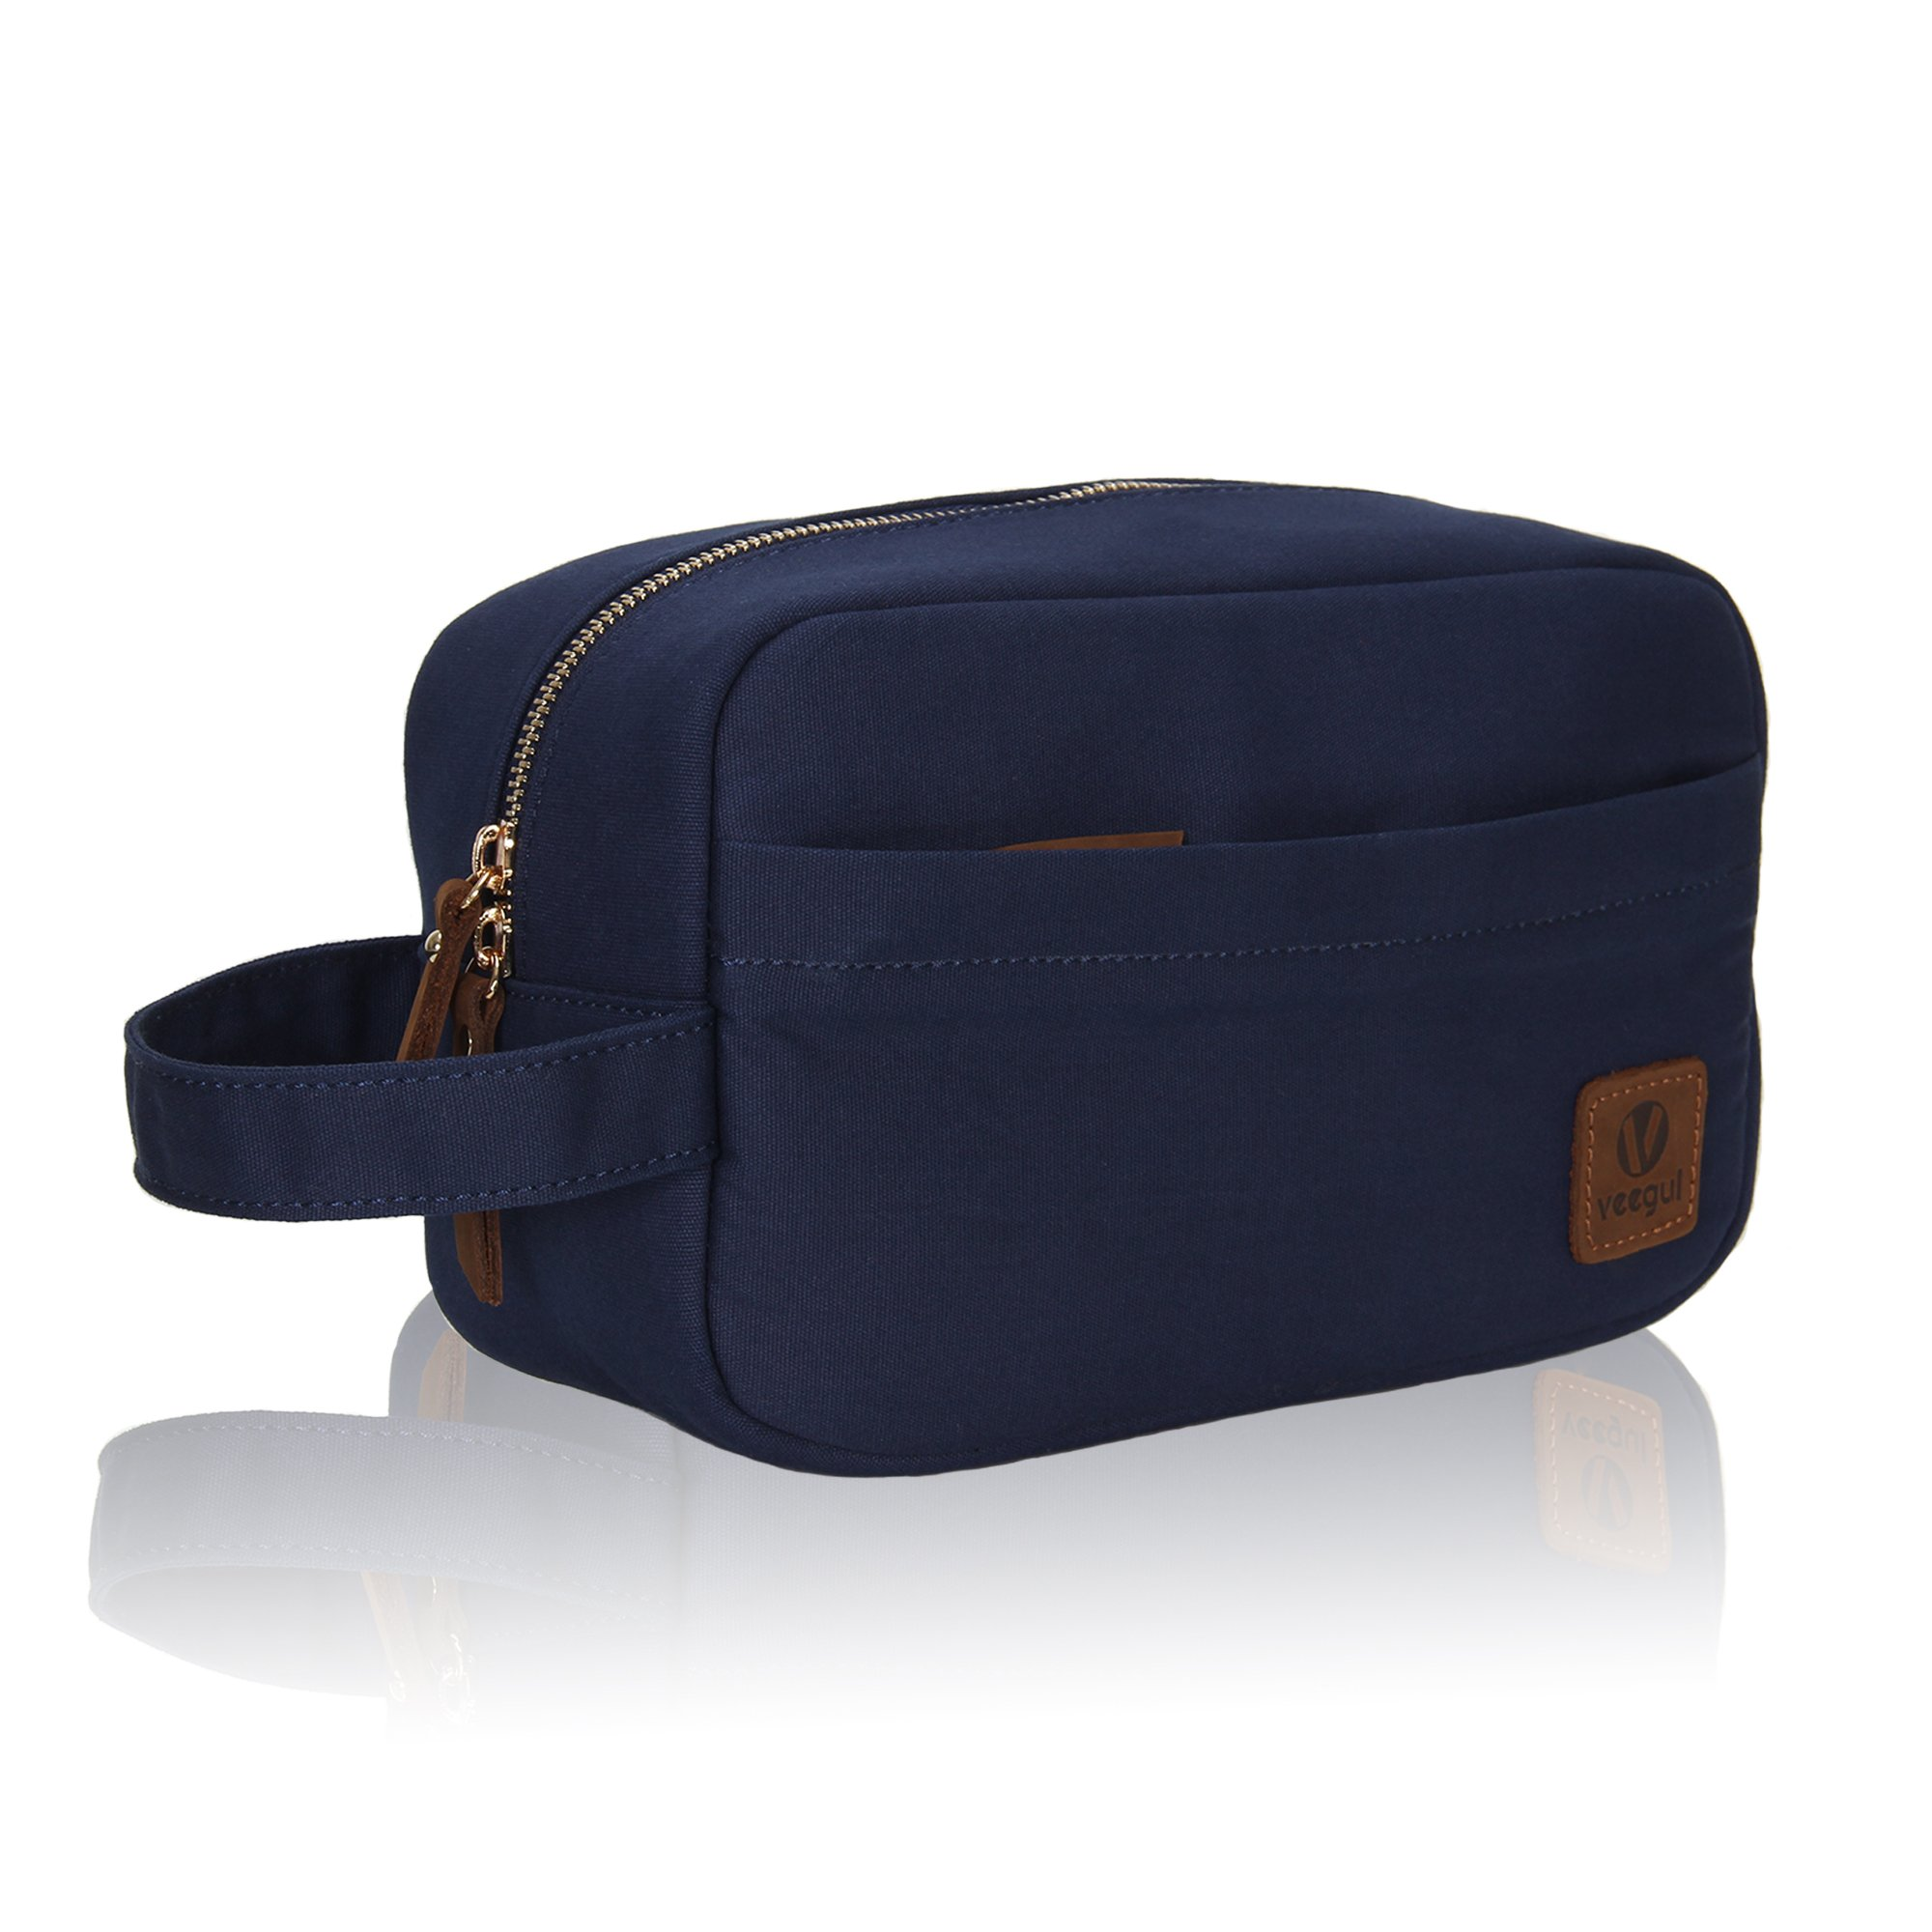 a0914354e1e KIPOZI PU Leather Travel Bag,Shaving Dopp Kit bag for Man,Toiletry Bag  Waterproof